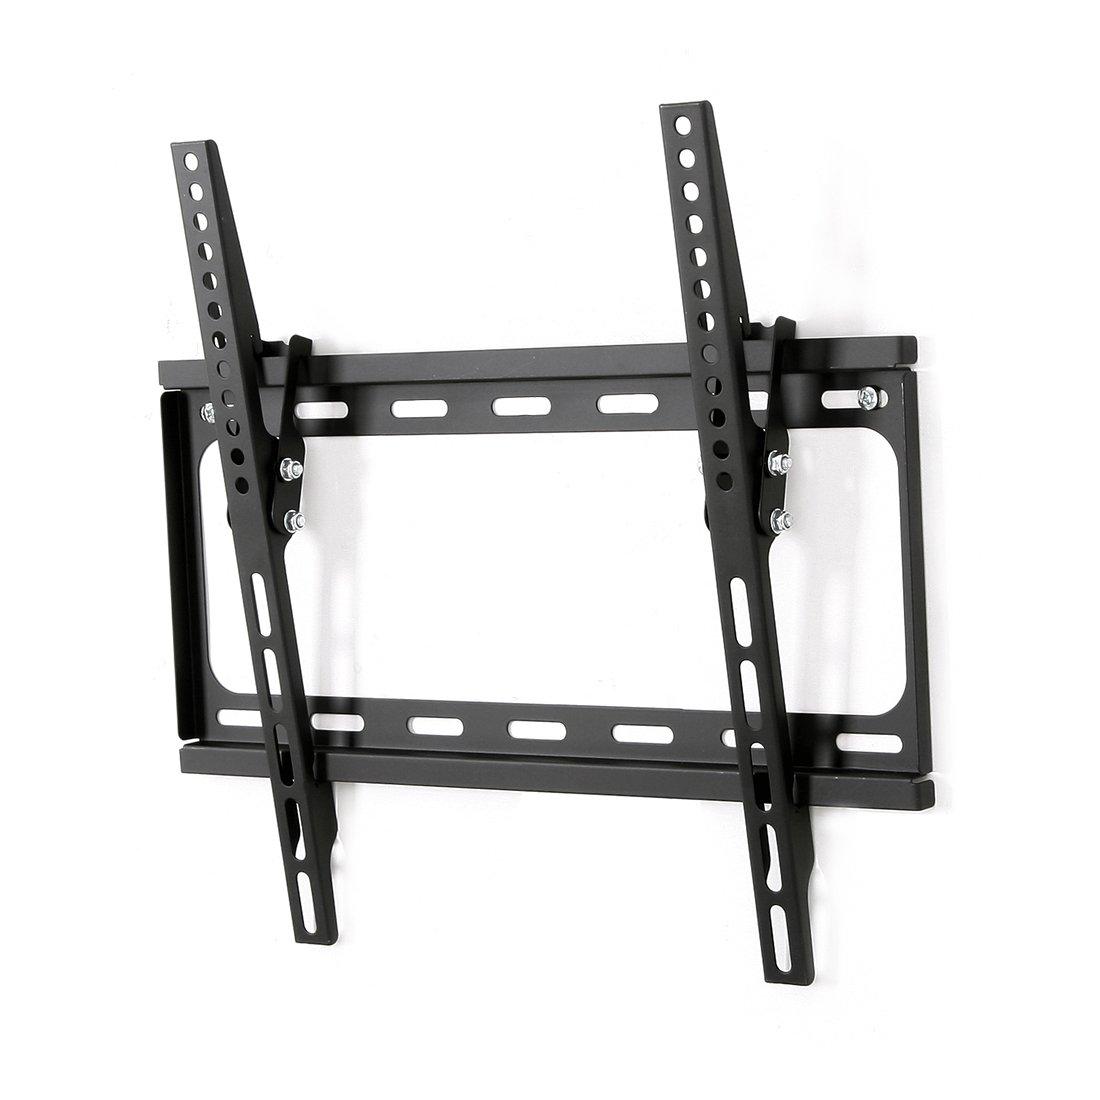 Fleximounts Tilt TV Wall Mount Bracket for most 26-55 Inch Max 400x400mm for Flat Screen